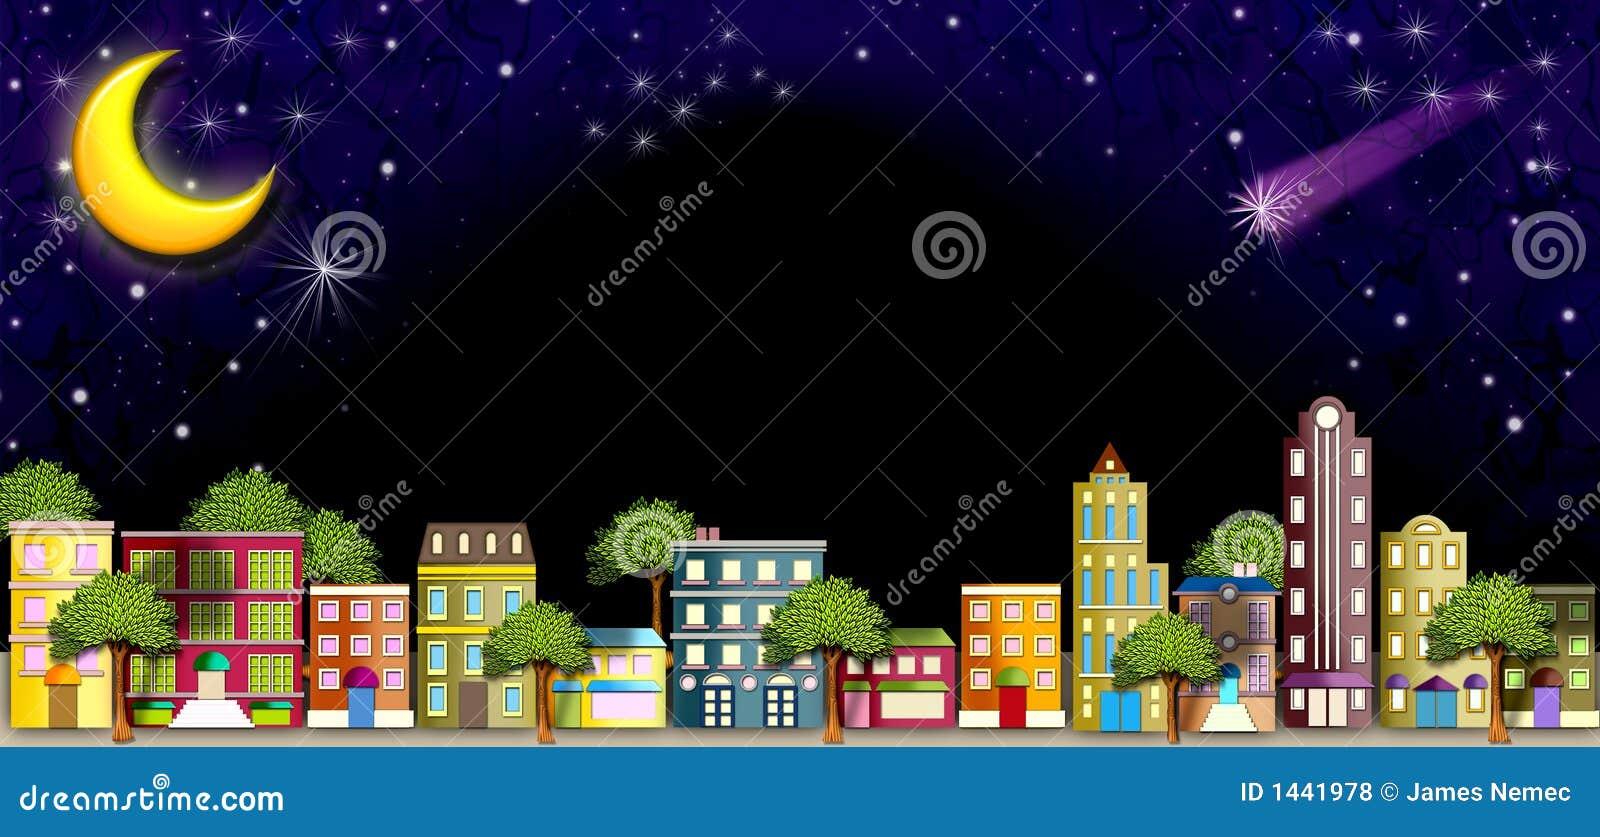 neighborhood street at Night